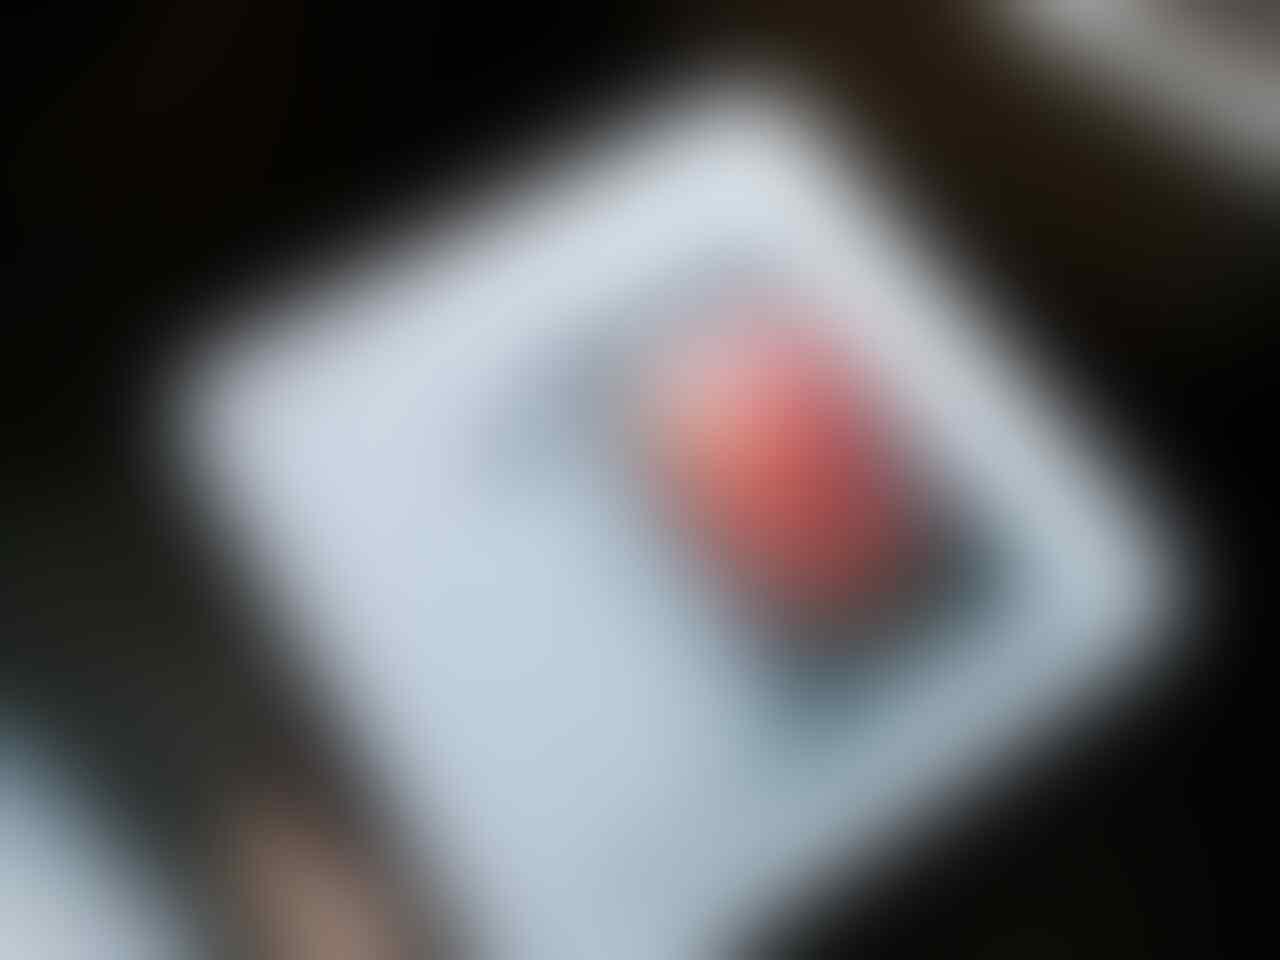 Jual HTC One harga 1.750.000 masih baru dngan harga murah.